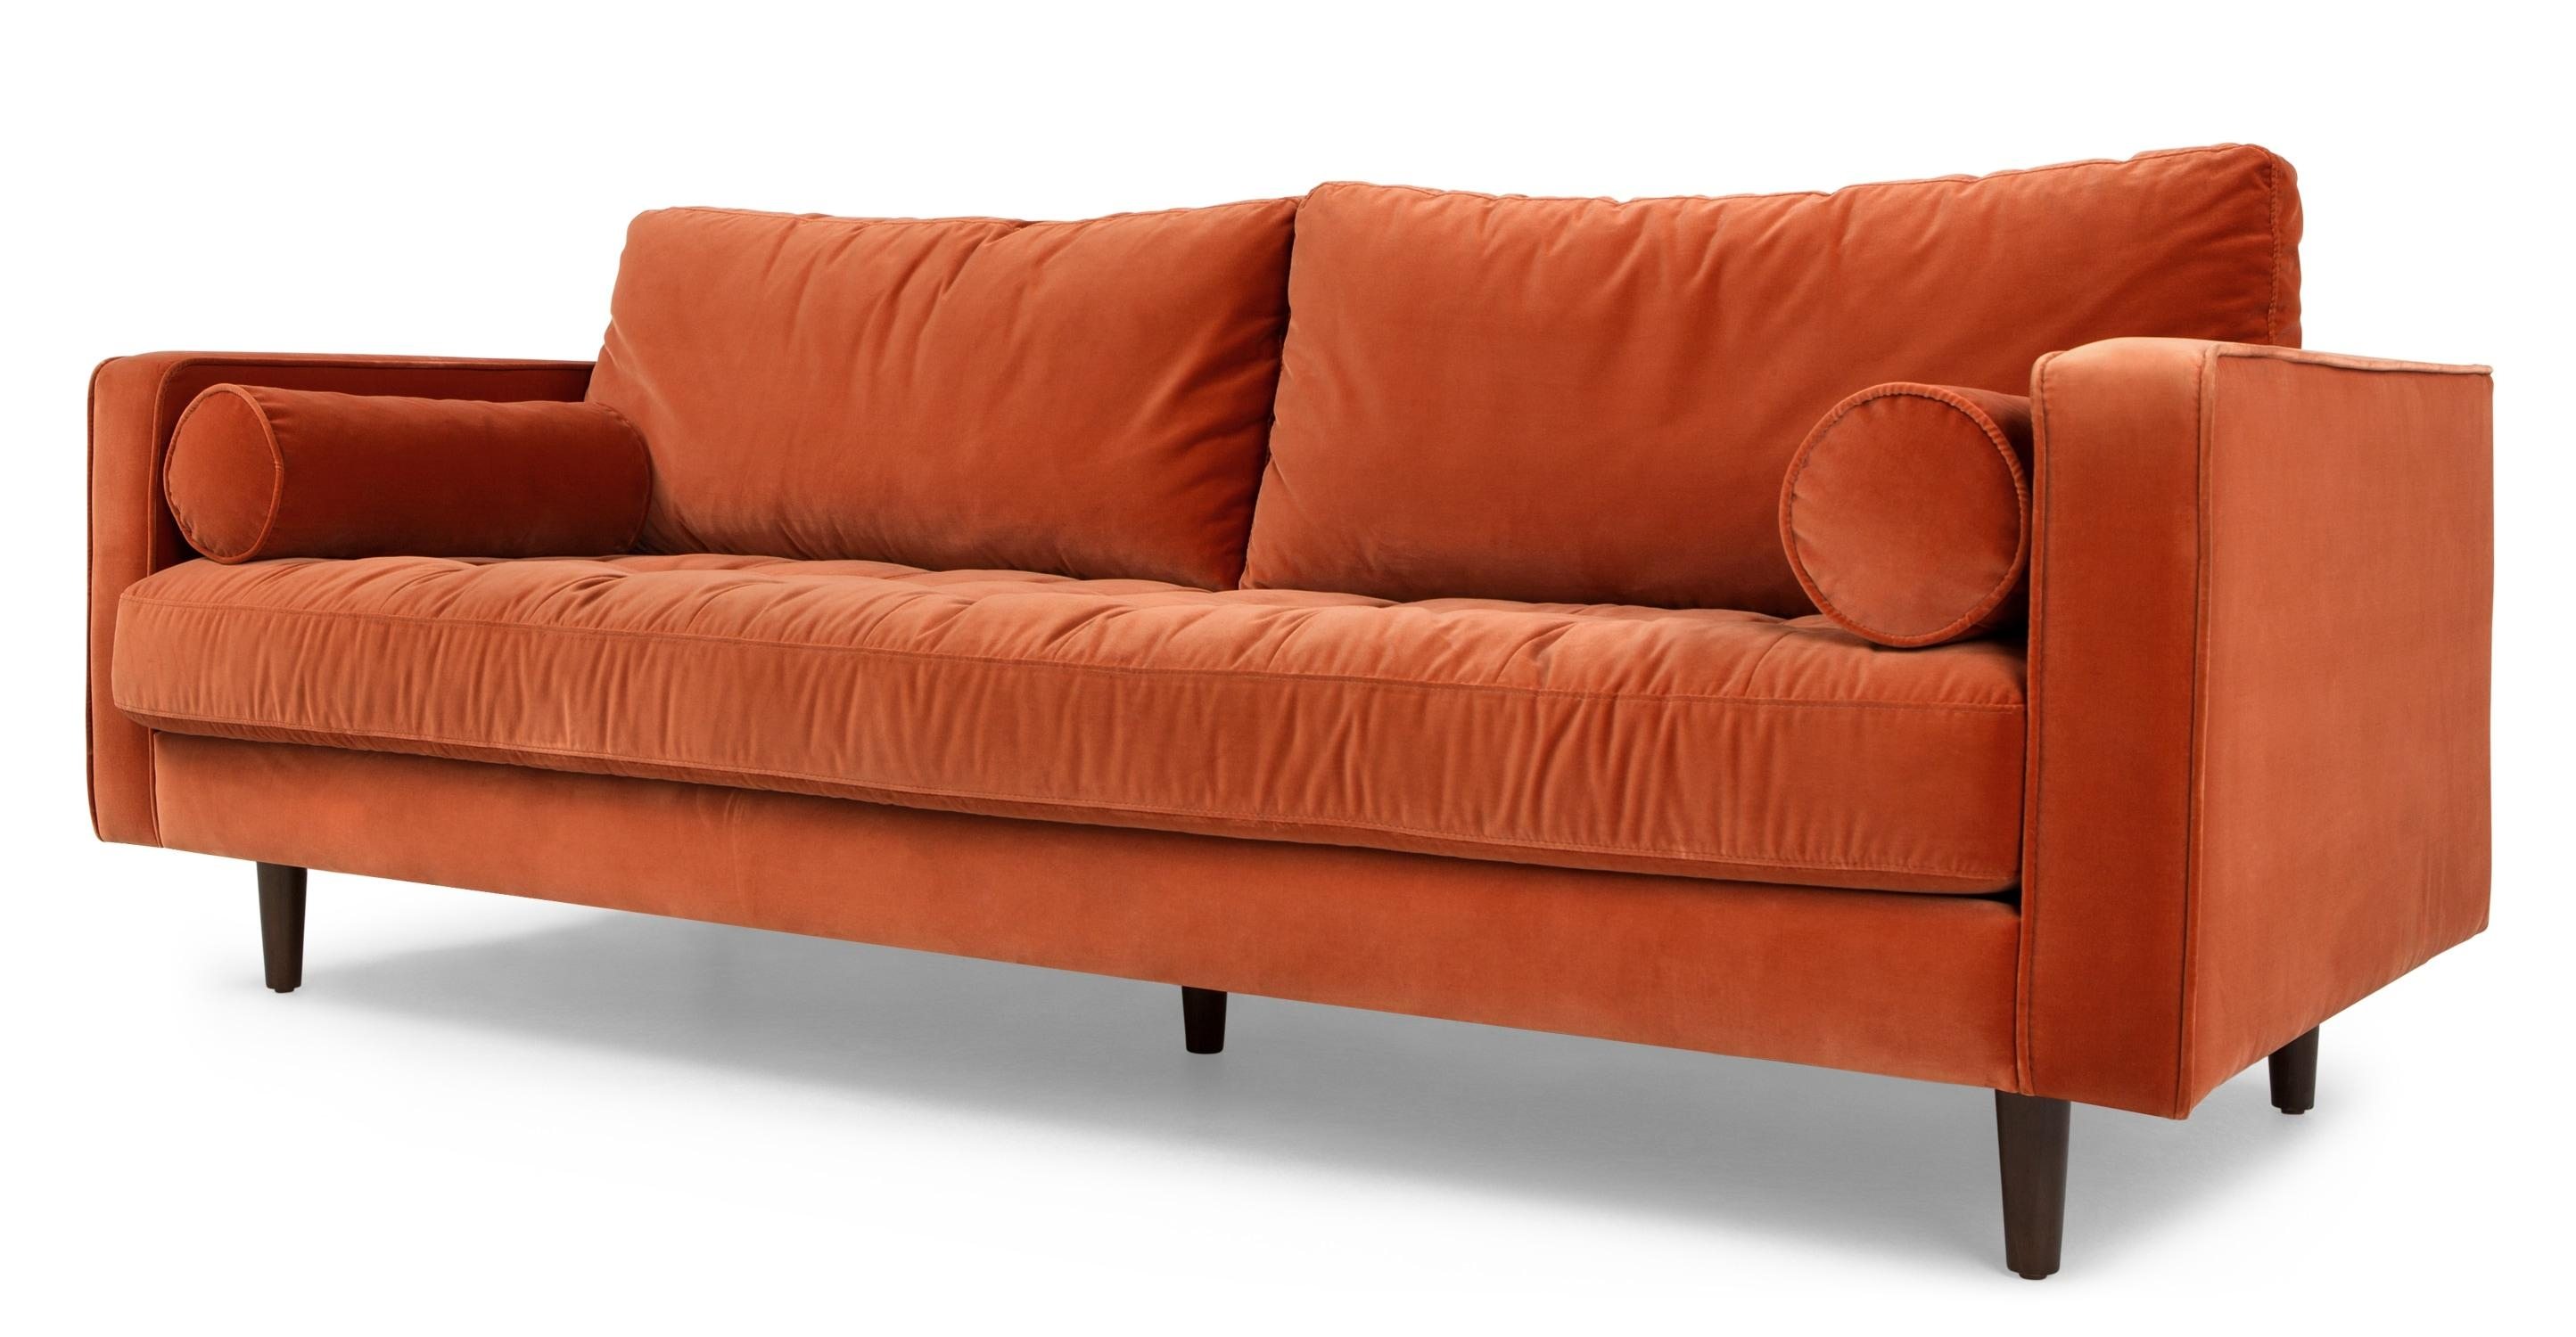 Scott 3 Seater Sofa, Concrete Cotton Velvet | Made In Burnt Orange Sofas (View 5 of 20)